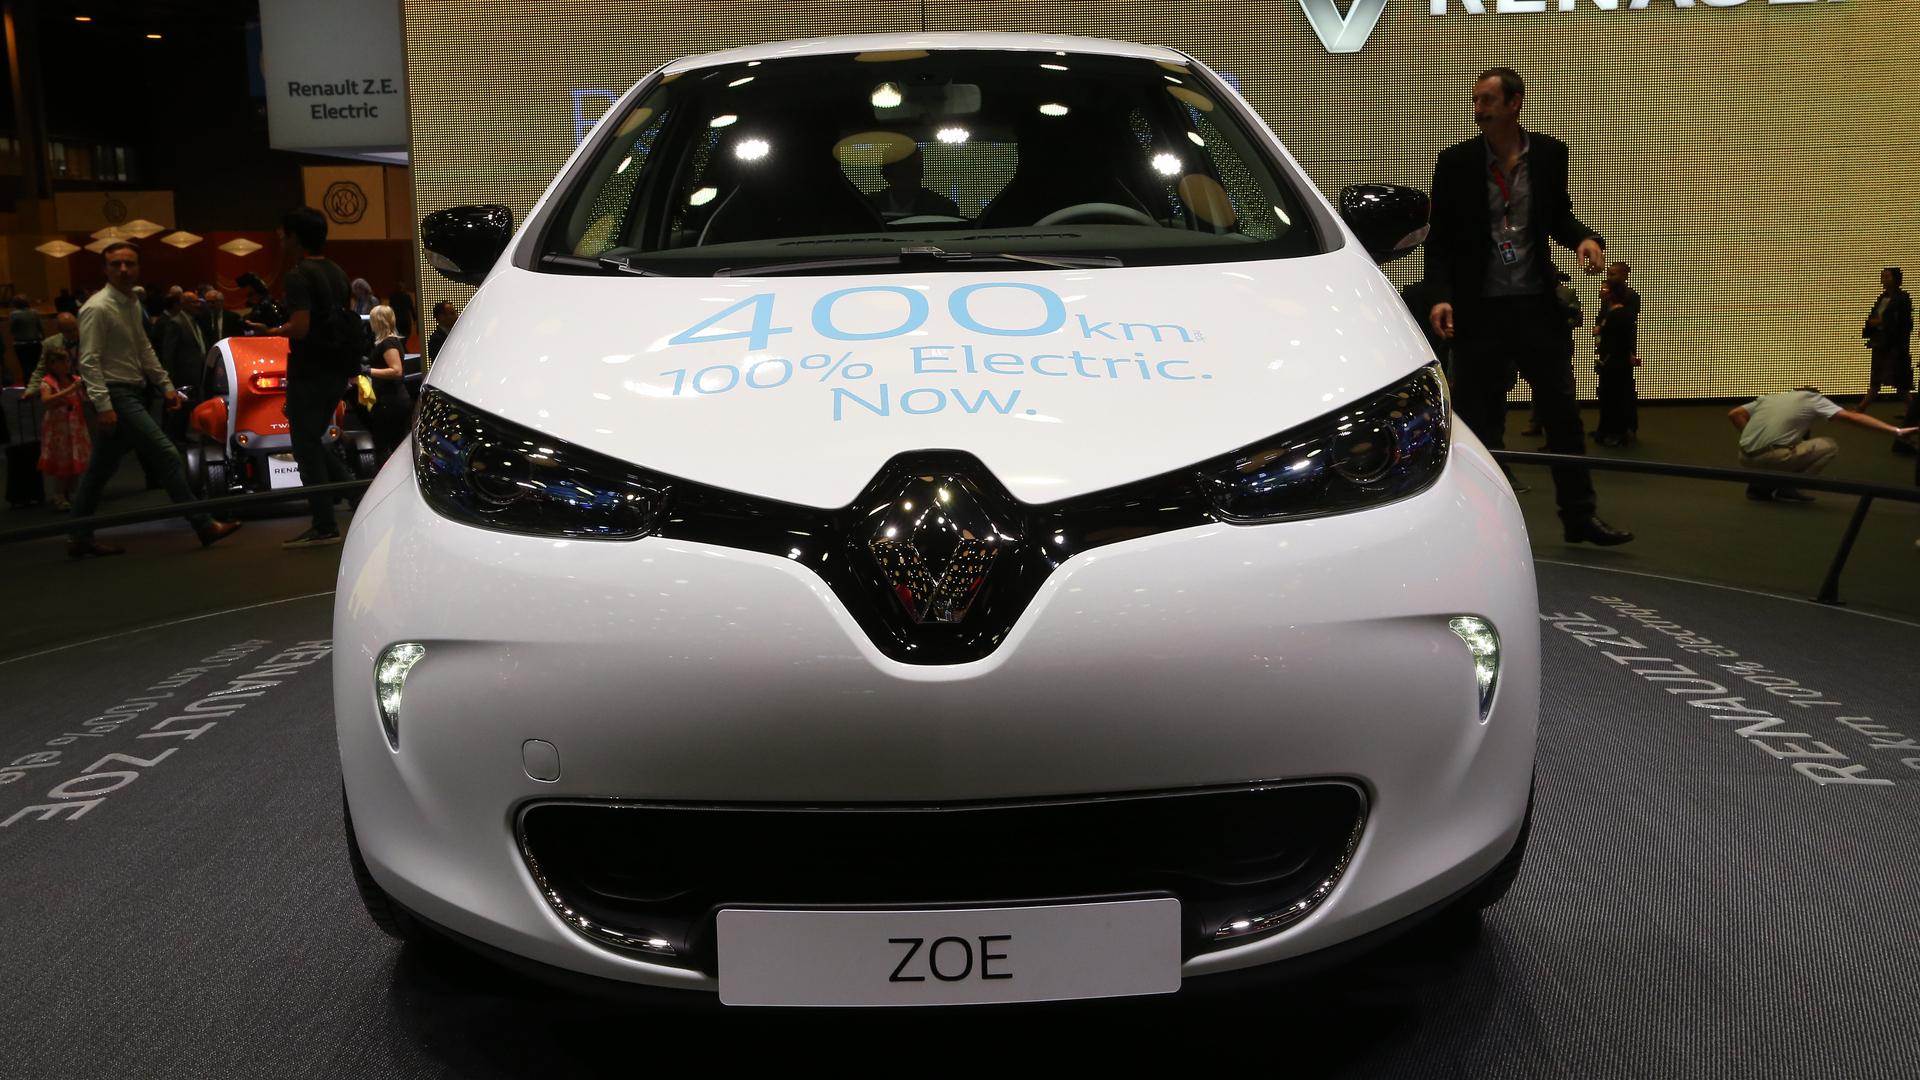 Renault Zoe ZE 40 plugs into Paris with 250-mile range